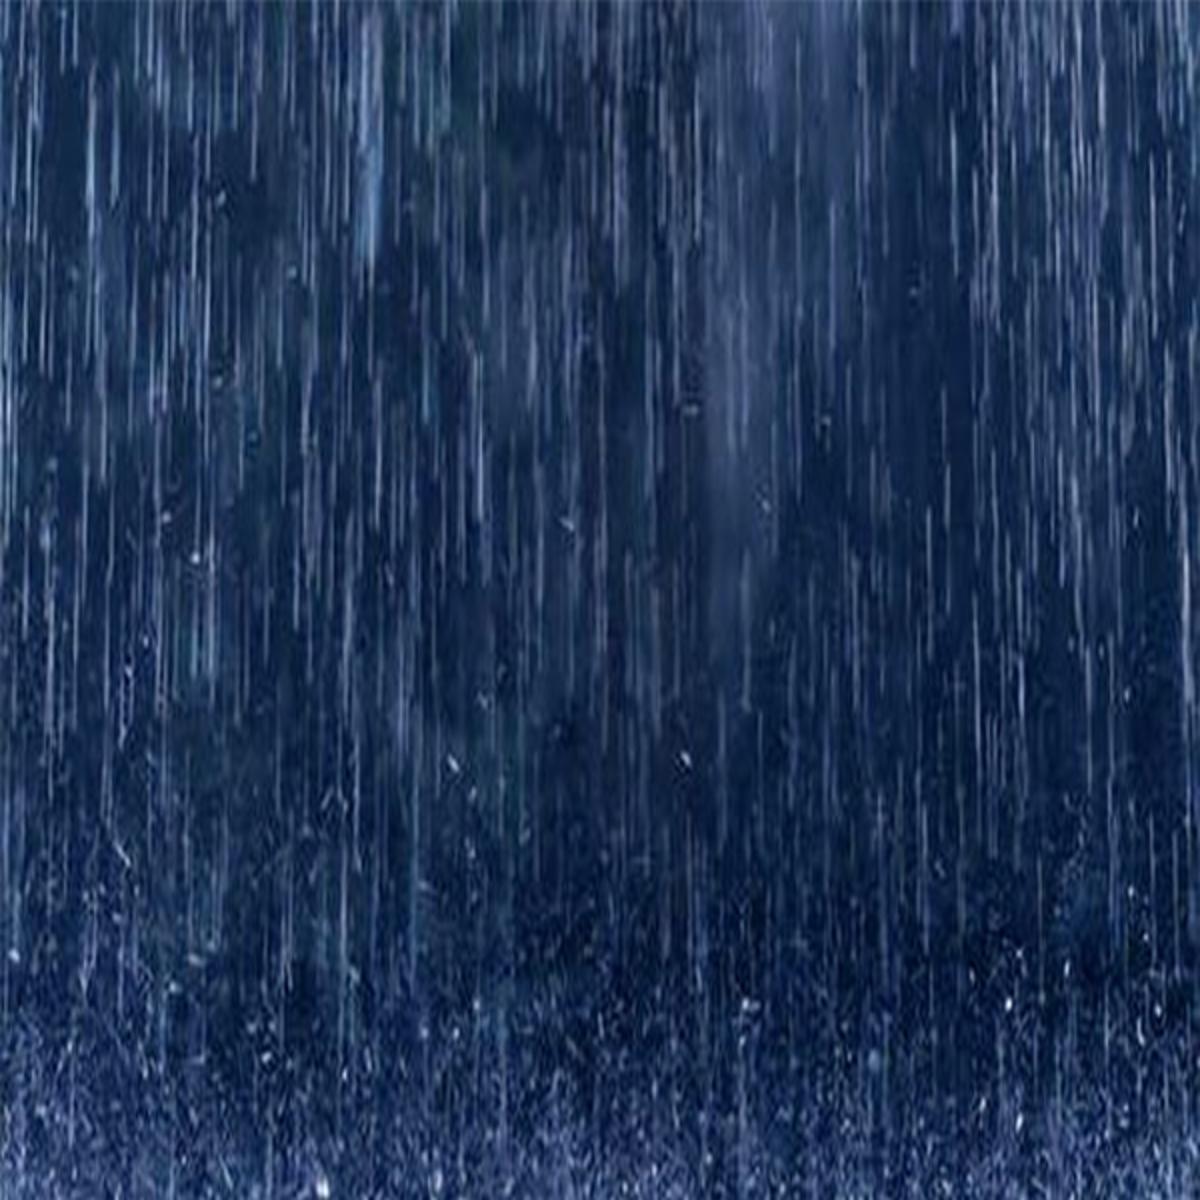 эффект дождя для фото пытались